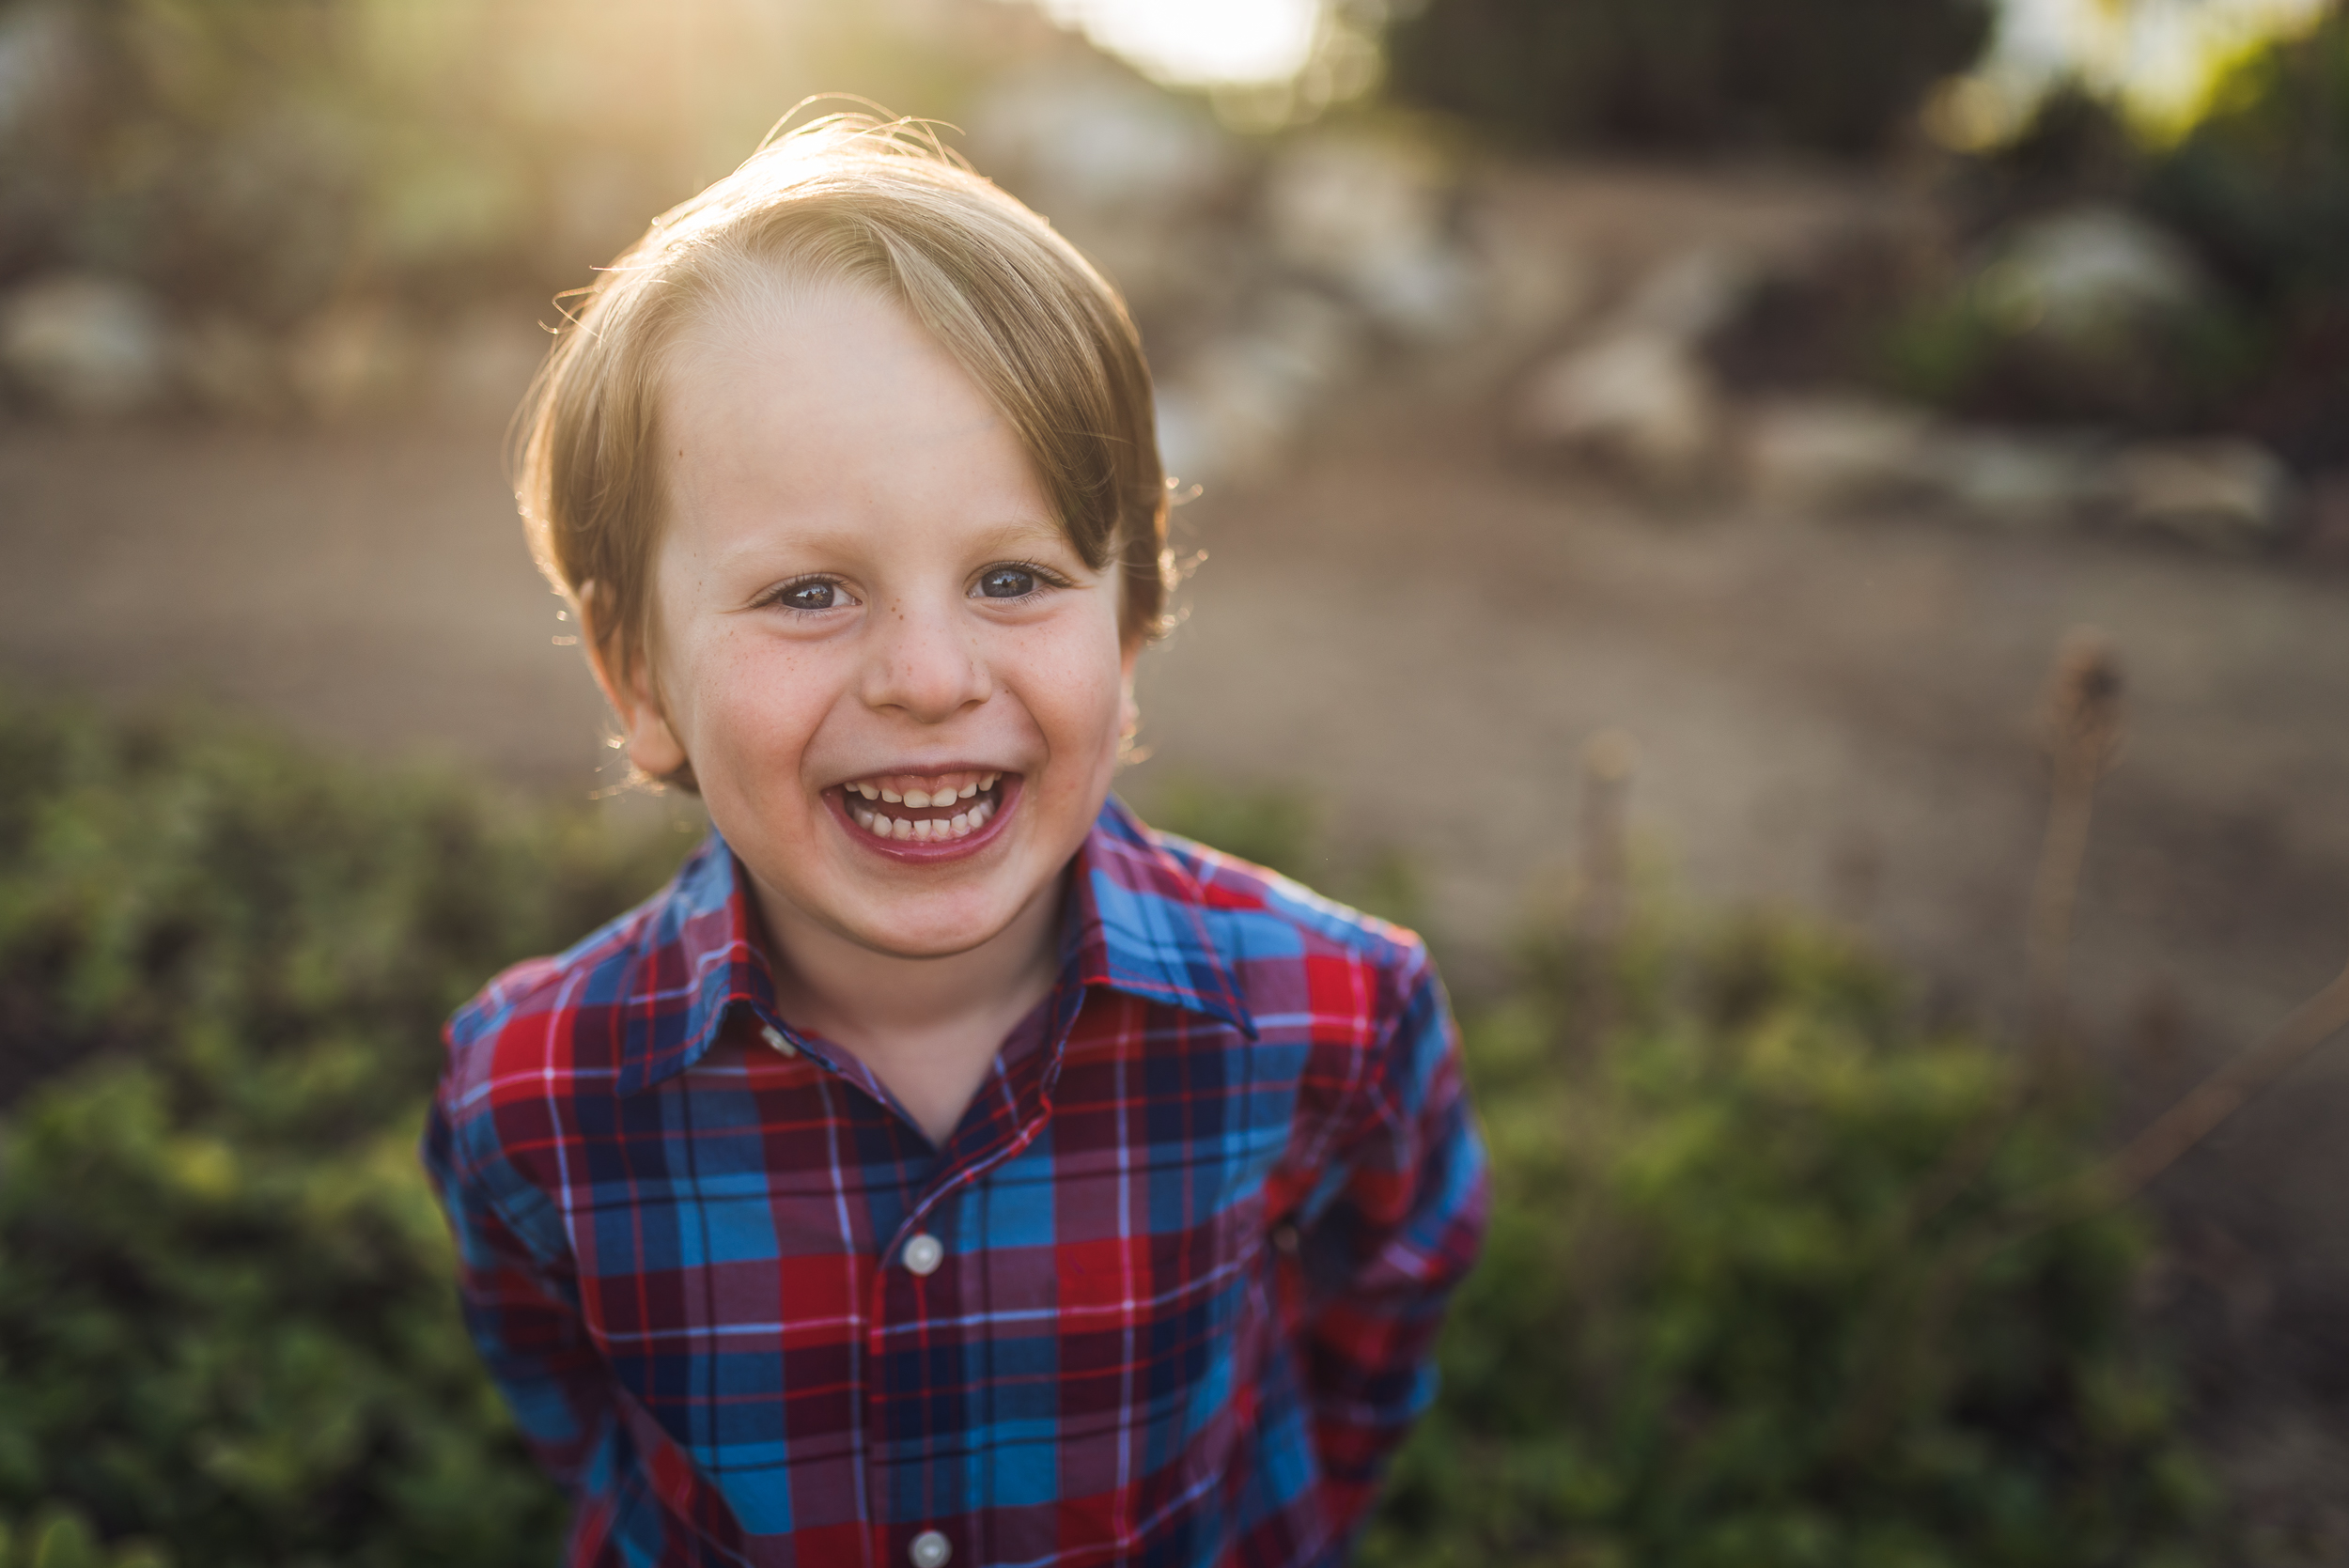 2018-San-Diego-Family-Lifestyle-Newborn-Travel-Vacation-Photographer-Kelsey-Smith-Photography-Coronado-La-Jolla-Encinitas-Solana-Beach-Del-Mar-164.jpg